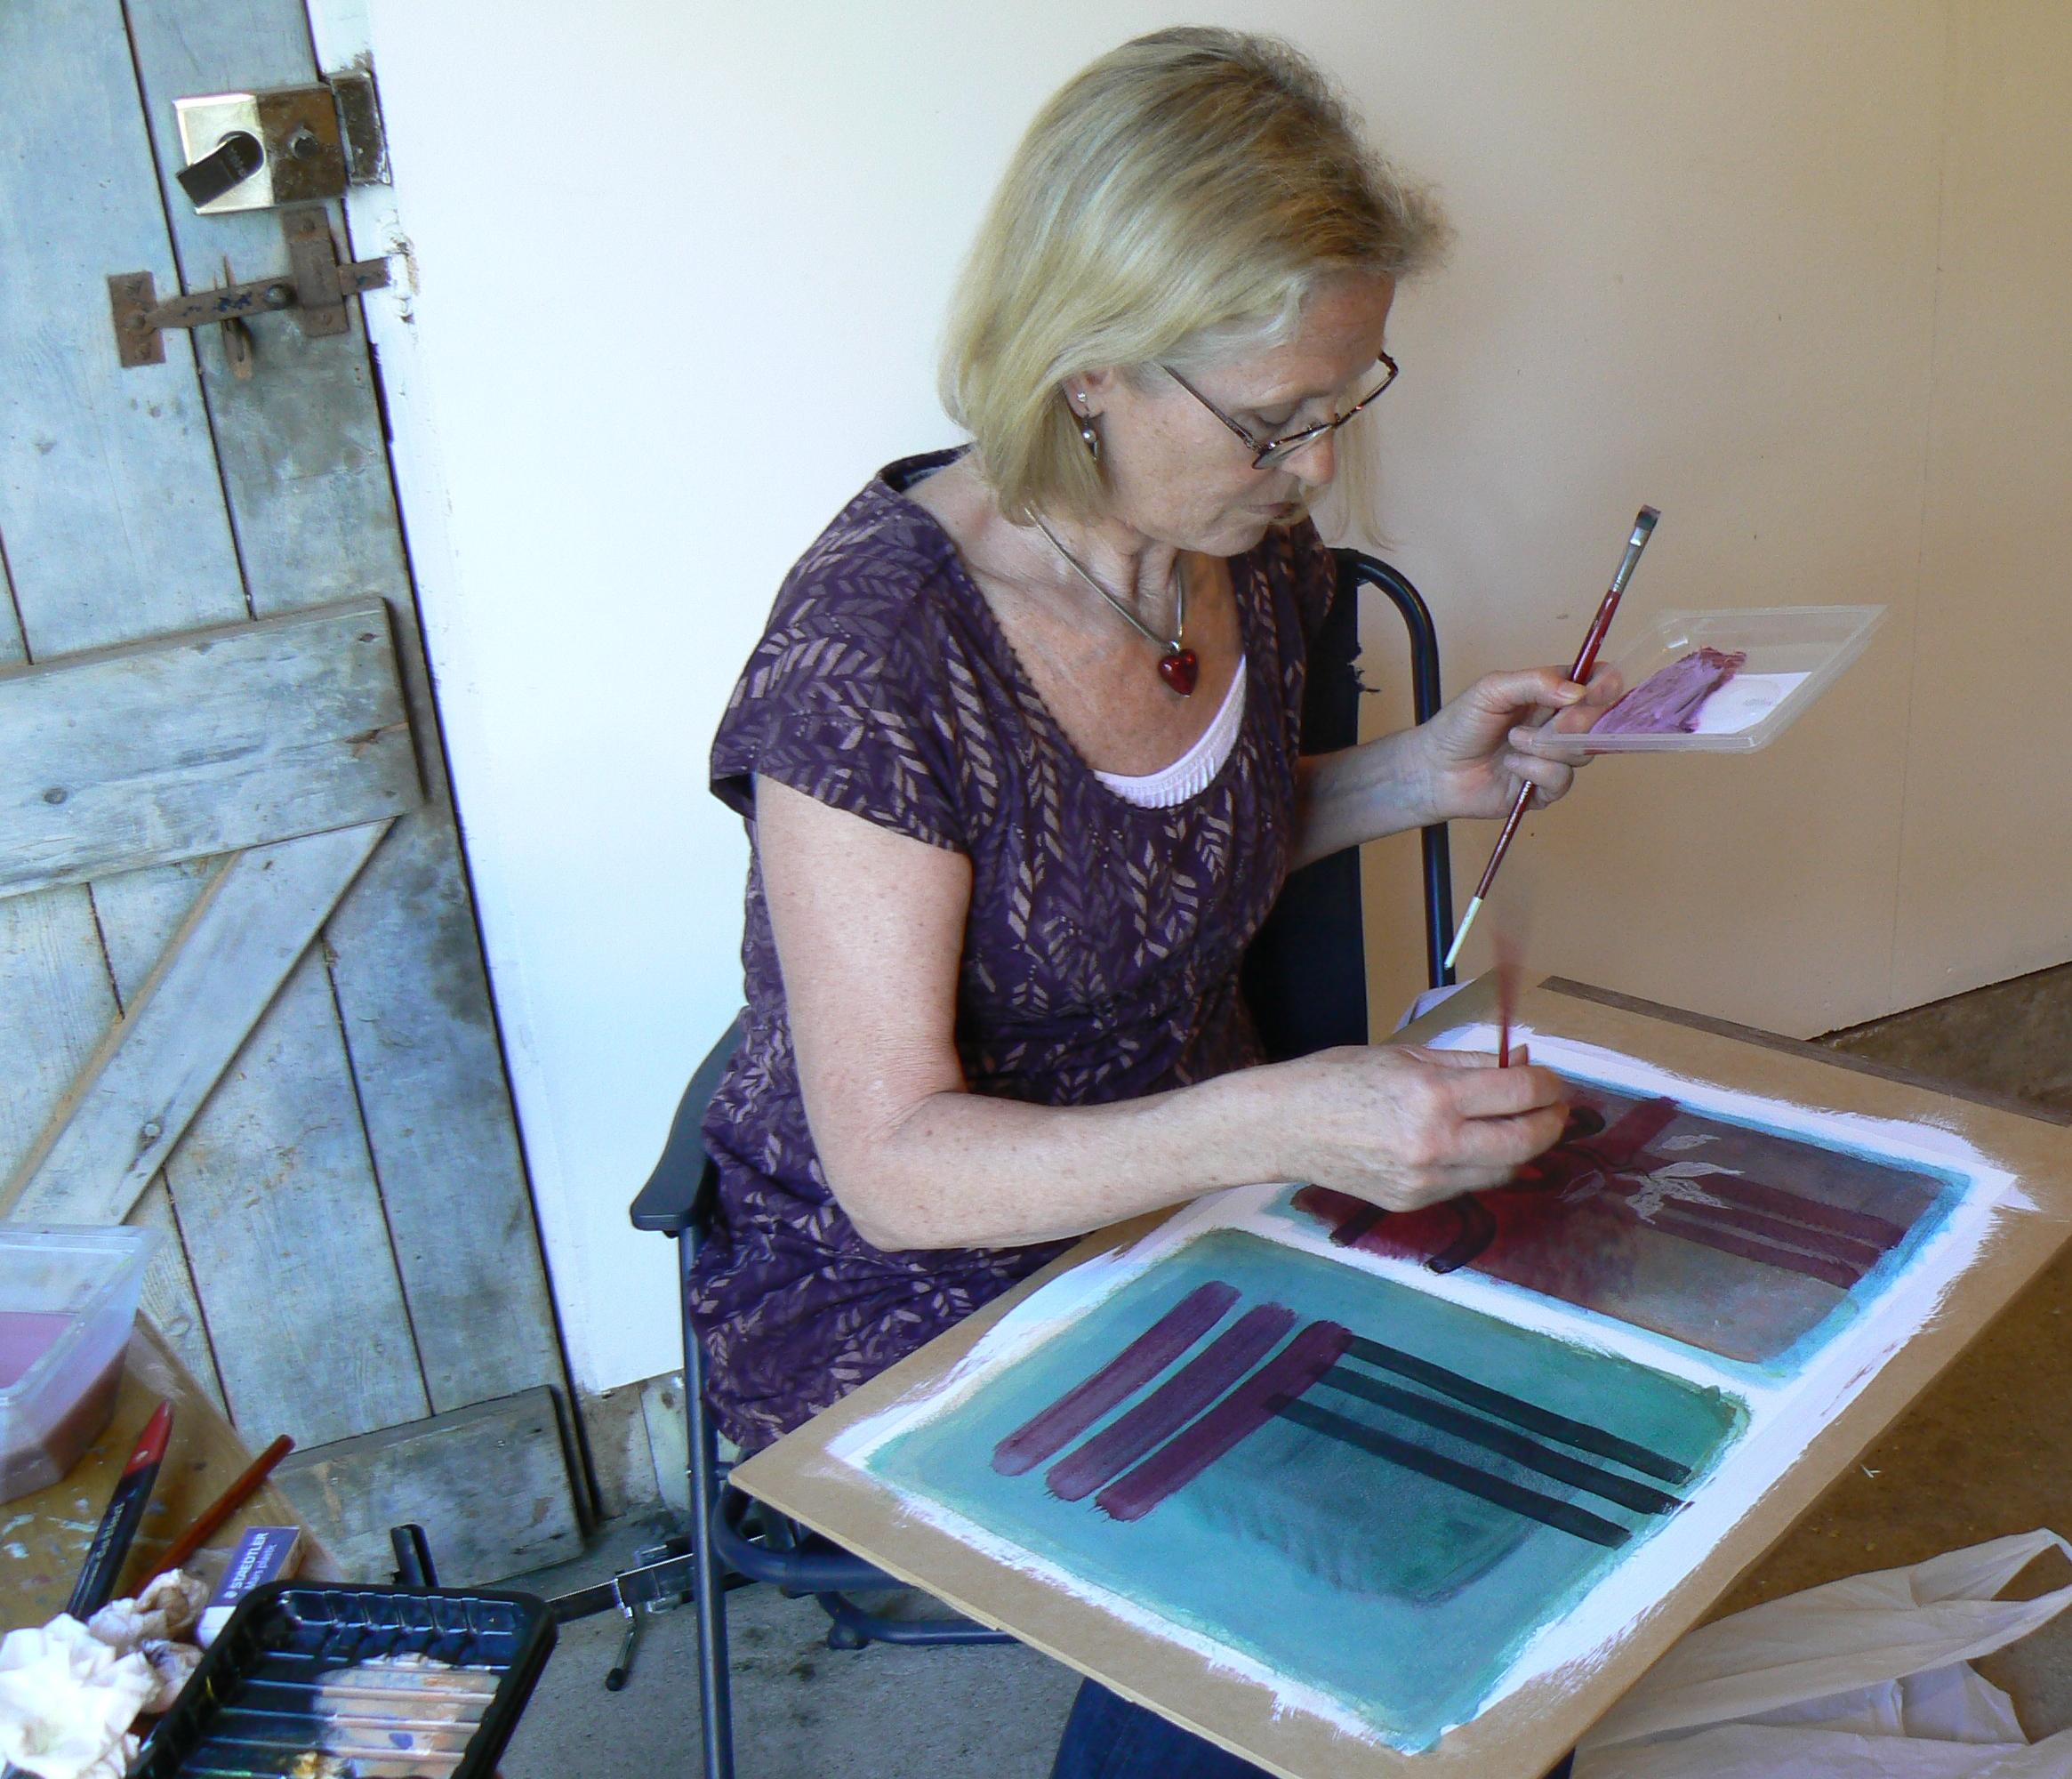 Sally starts painting.